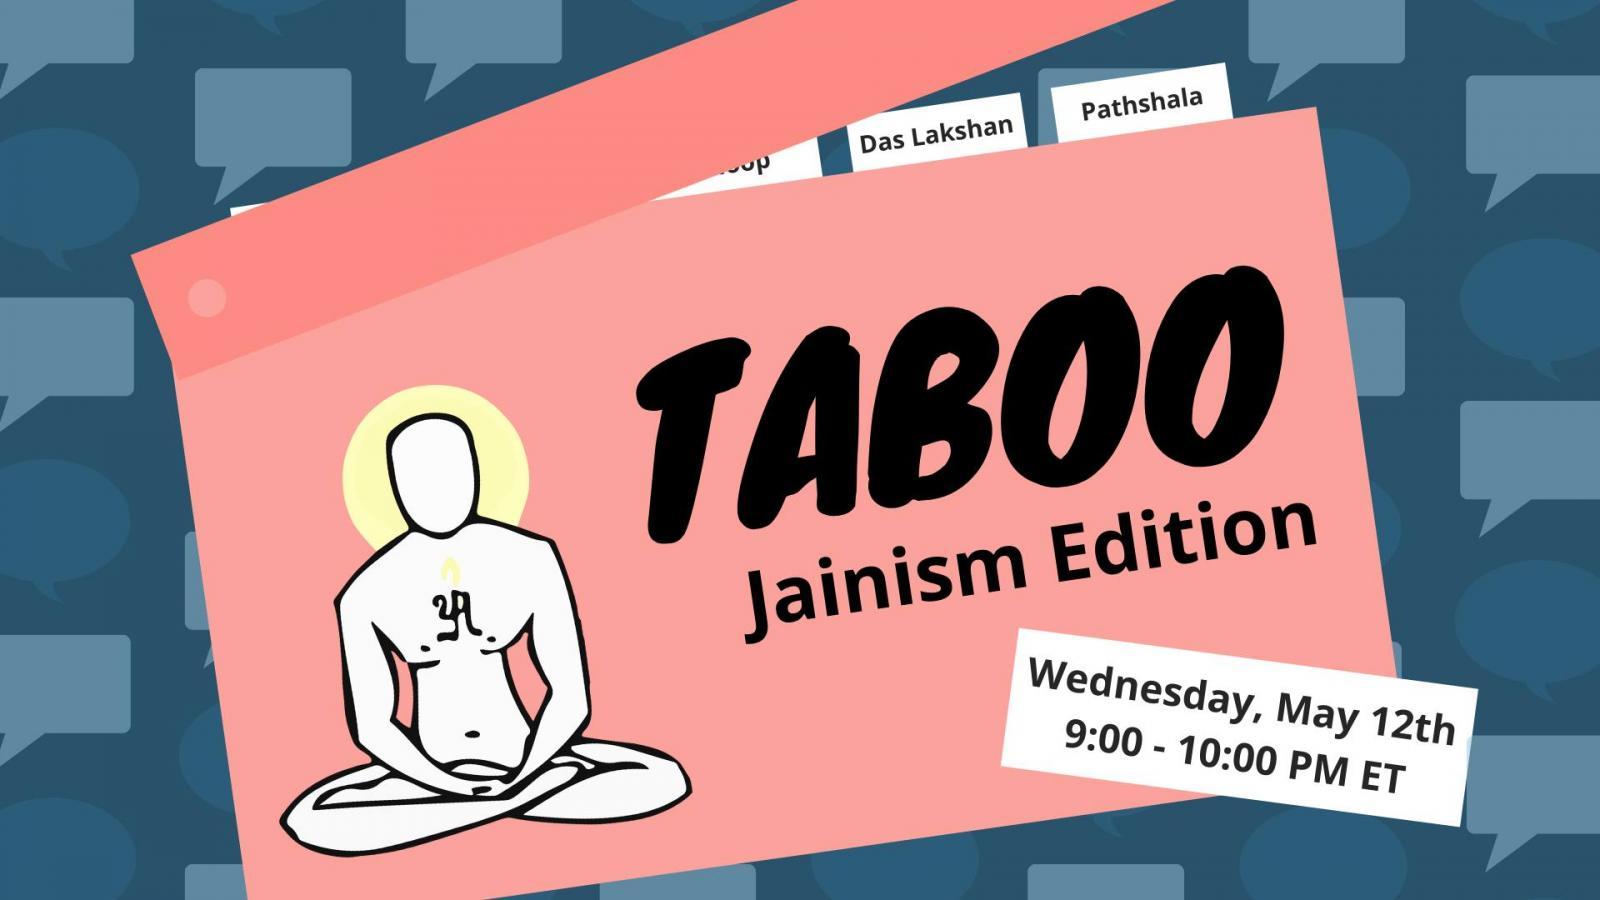 Taboo, Jainism Edition!